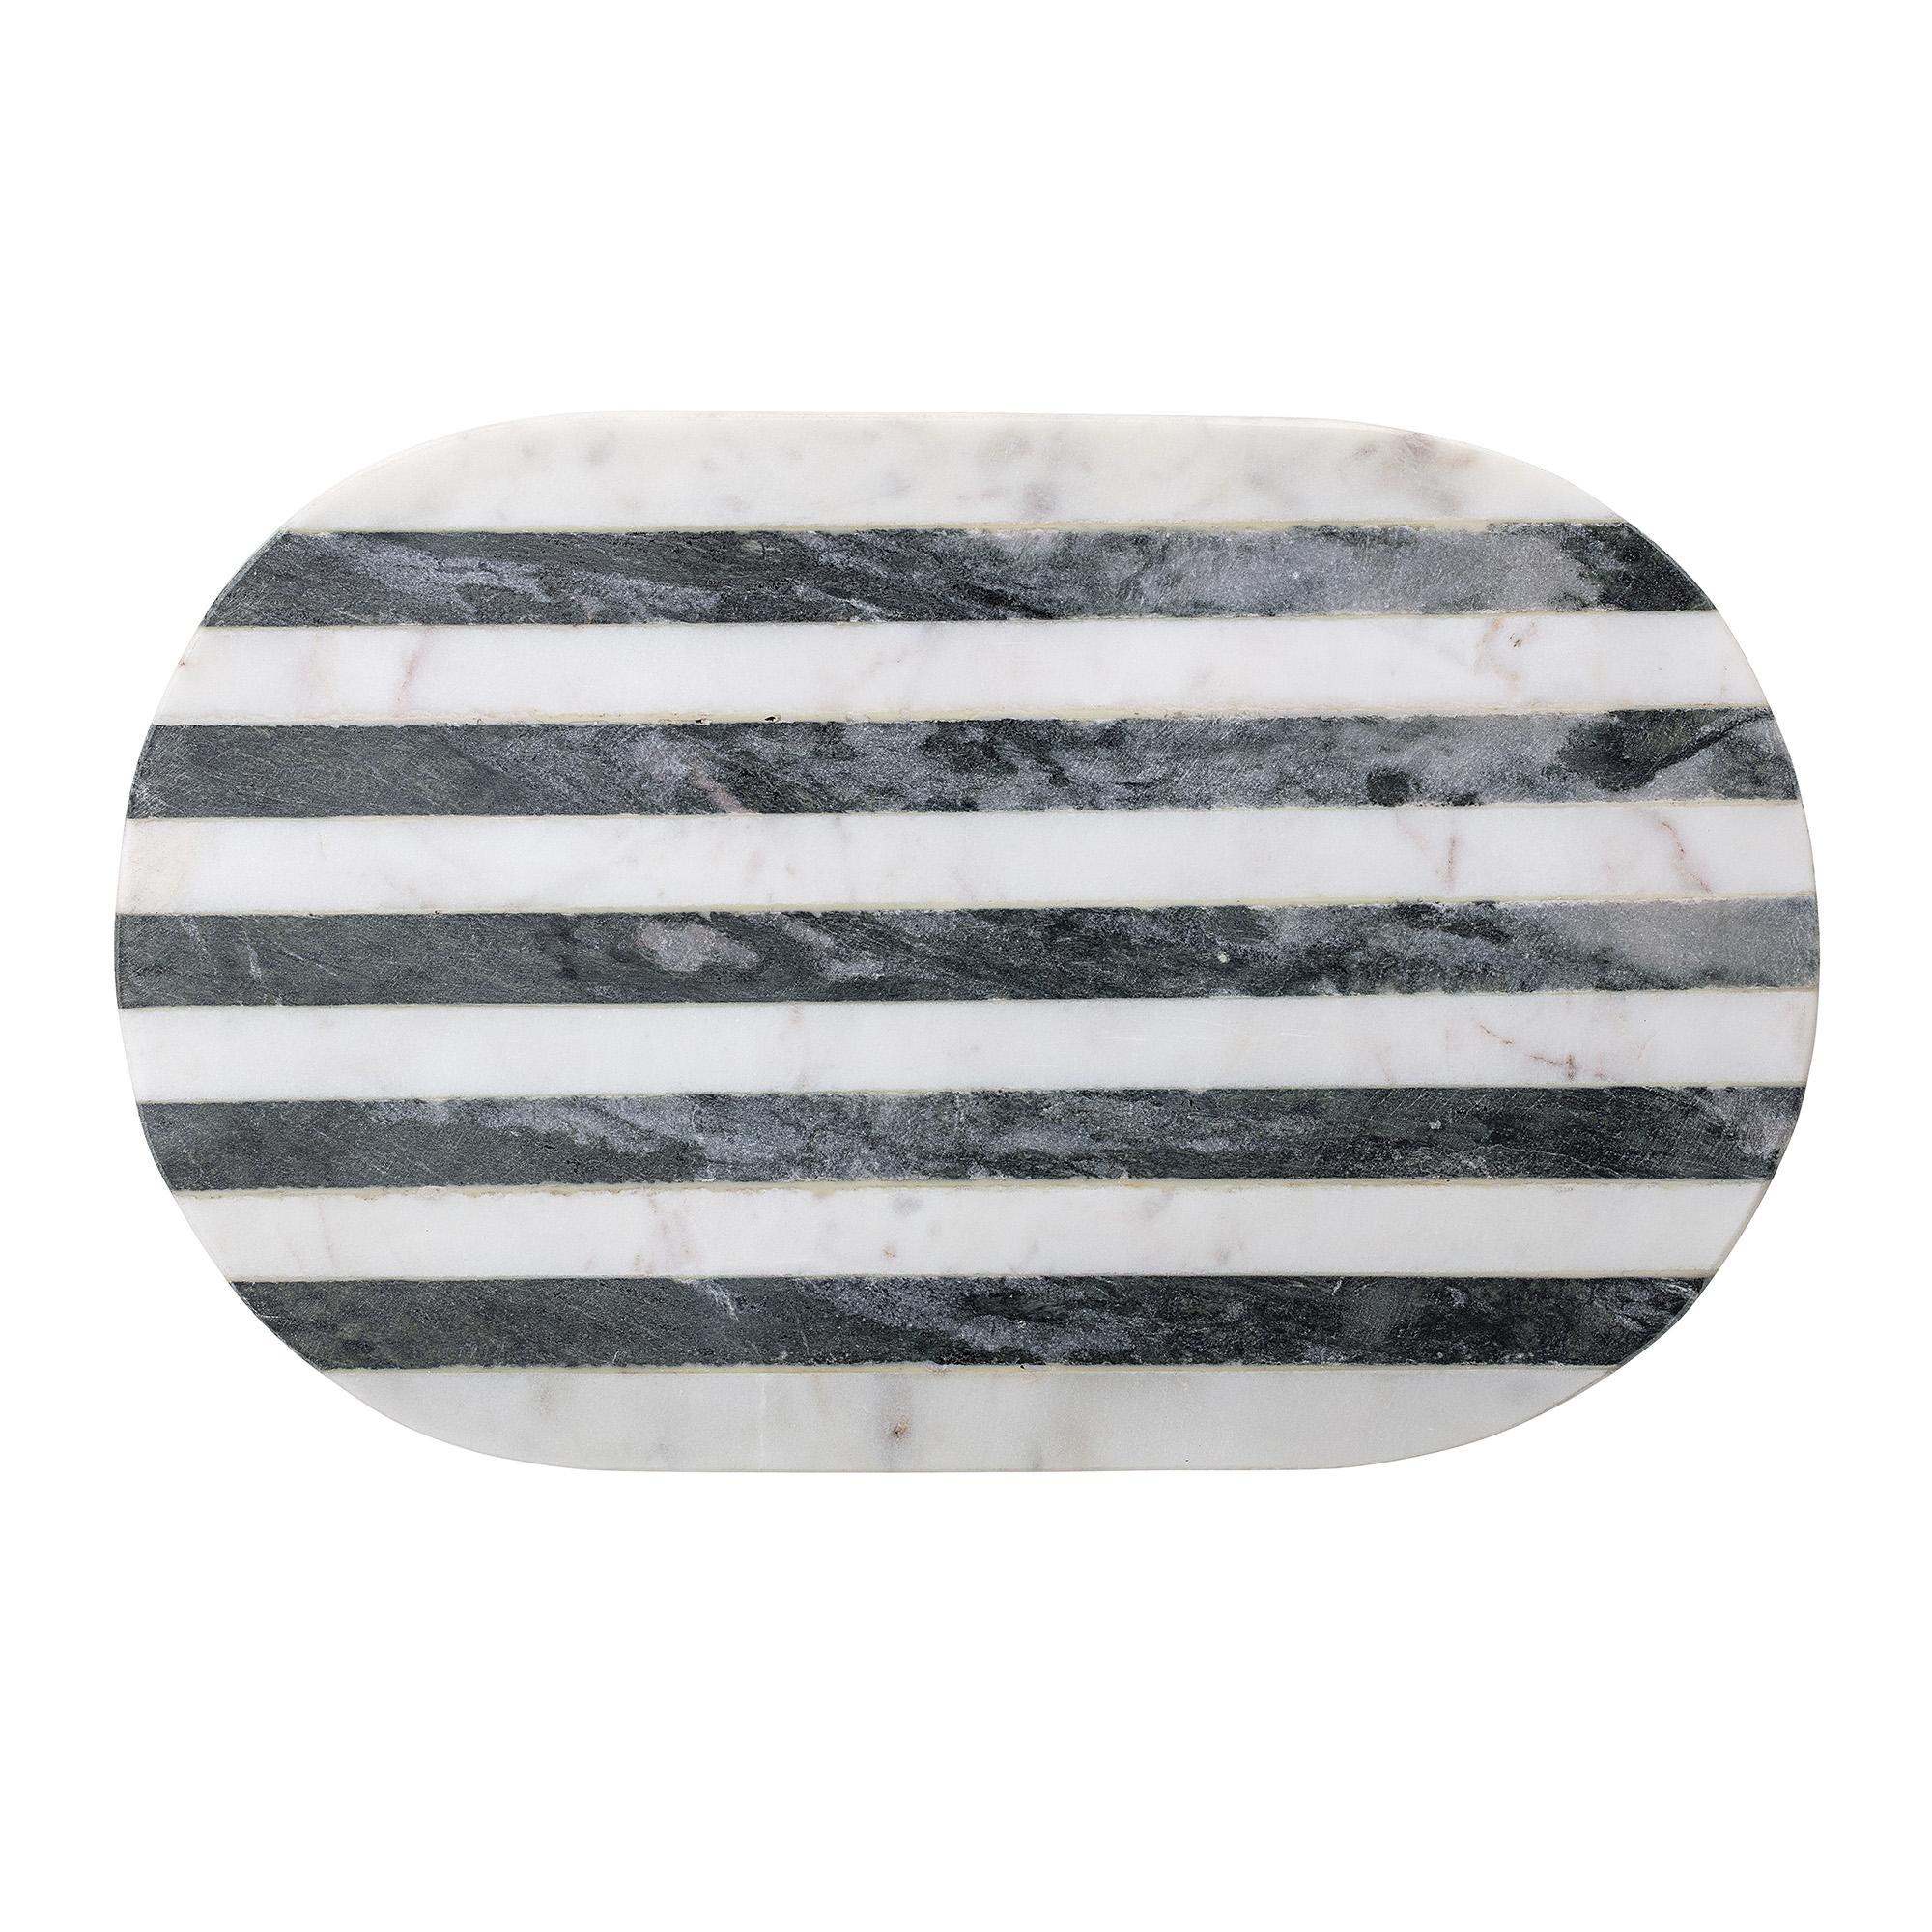 Serveringsbricka i Marmor Svart/Vit